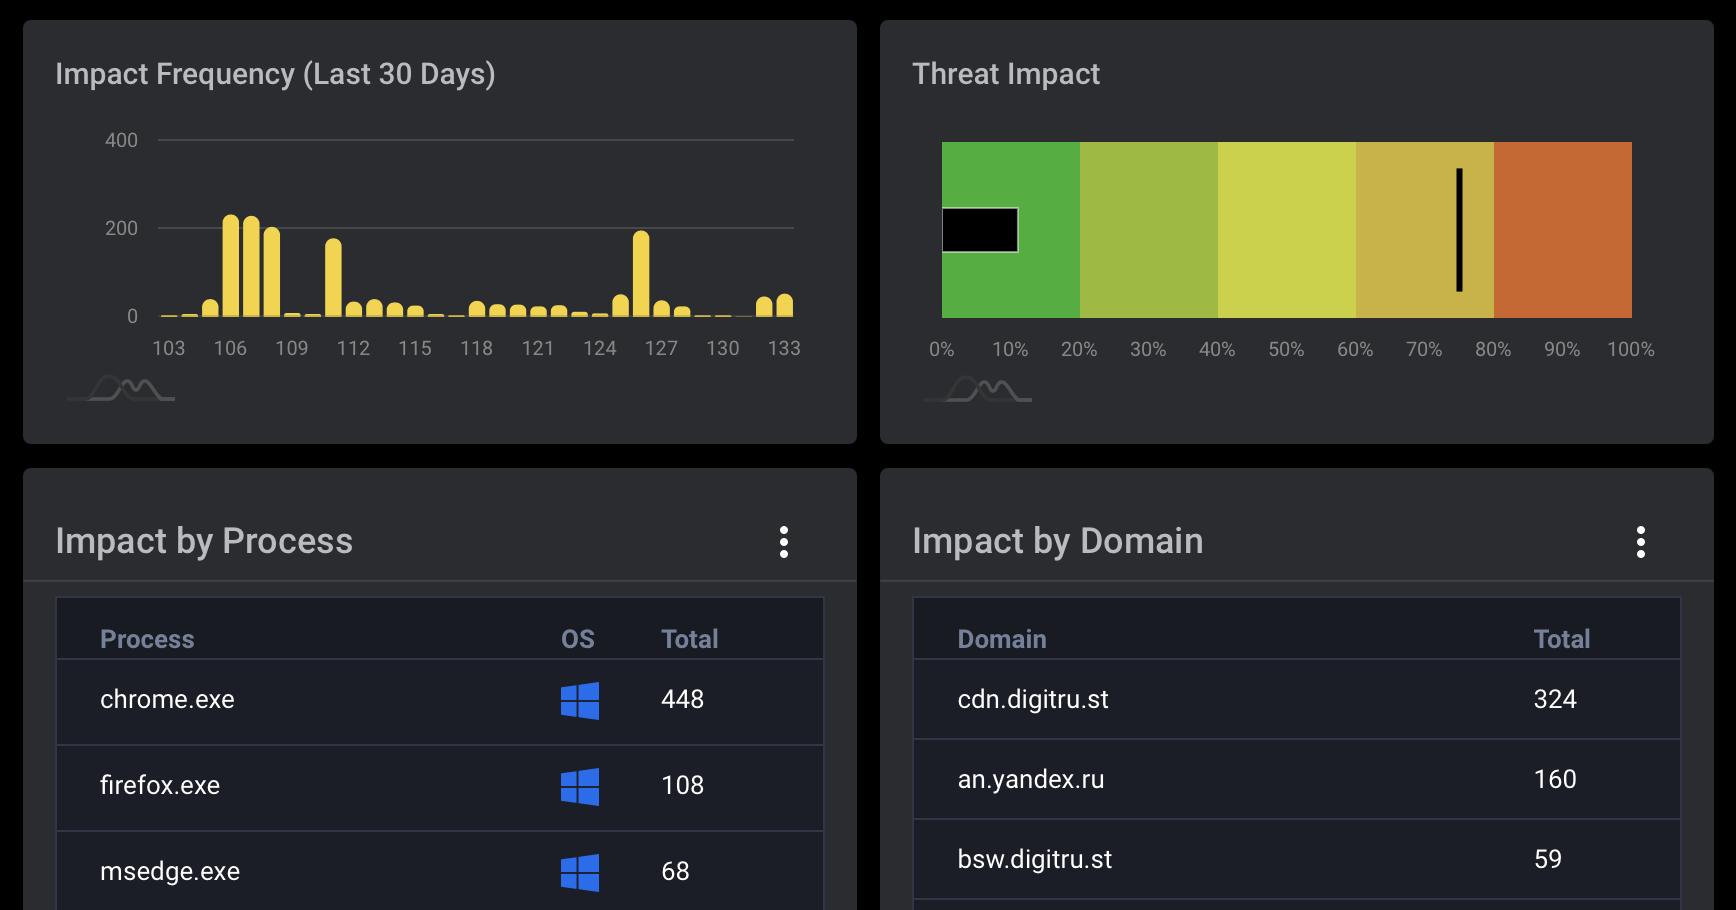 Data Security Impact